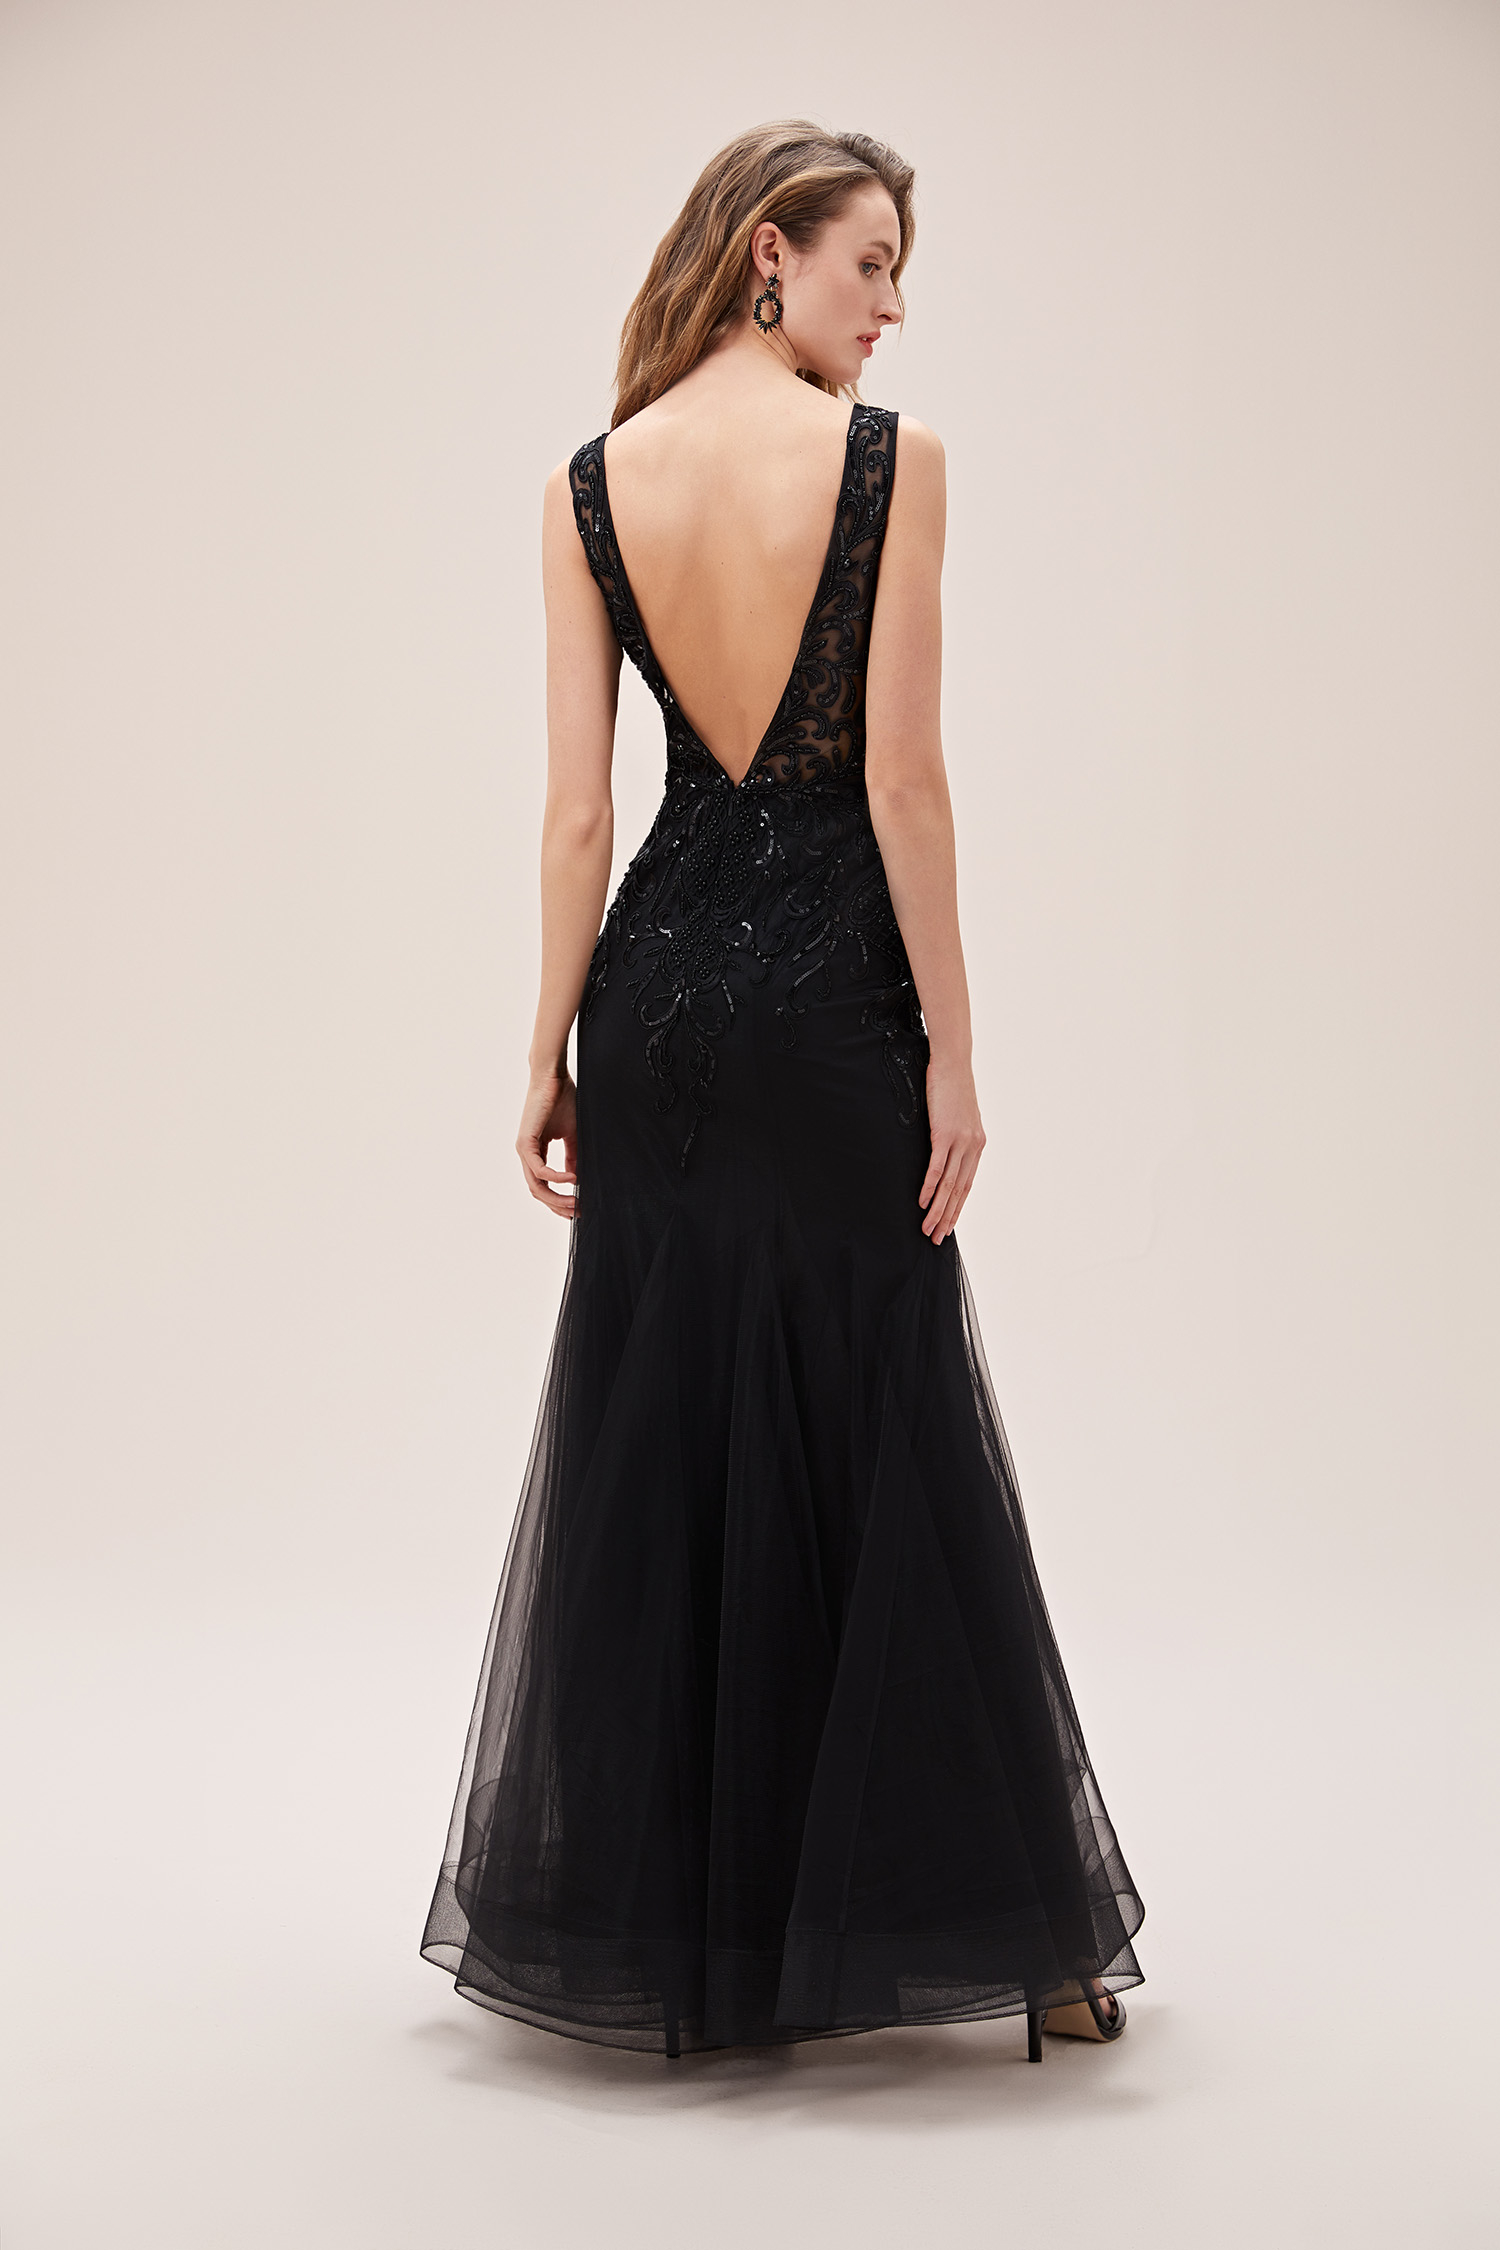 Siyah Payet İşlemeli V Yaka Tül Etekli Uzun Abiye Elbise - Thumbnail